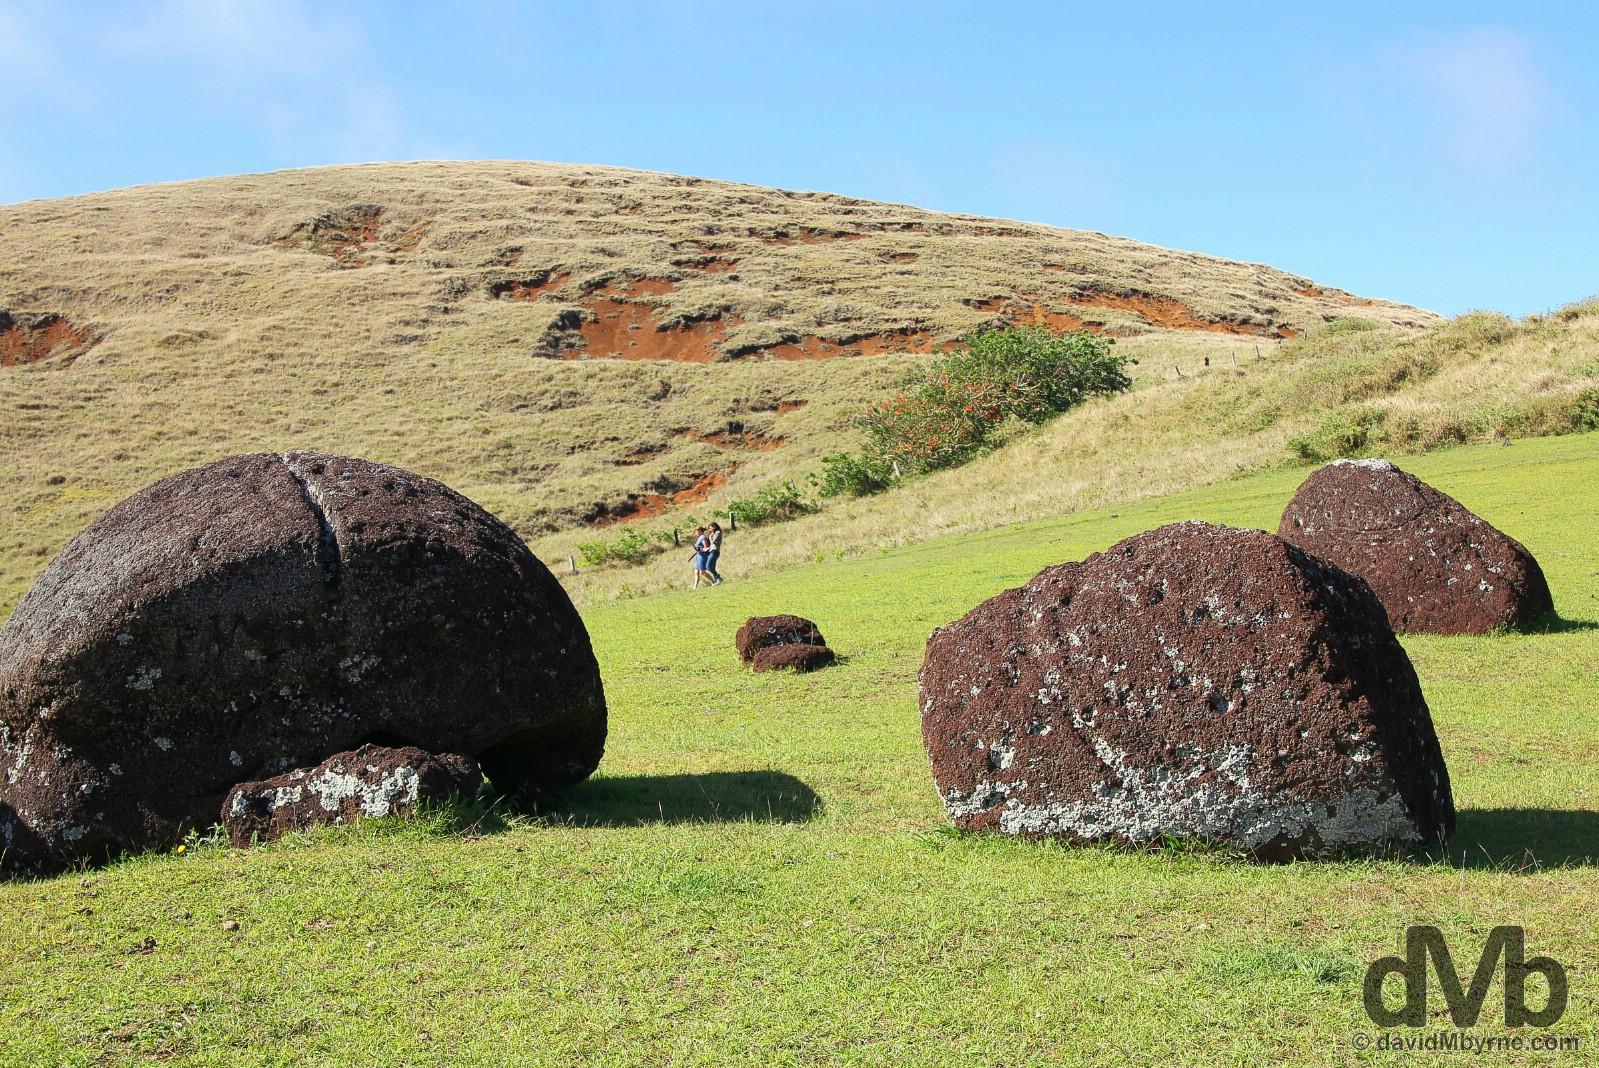 Puna Pau, Easter Island, Chile. October 1, 2016.